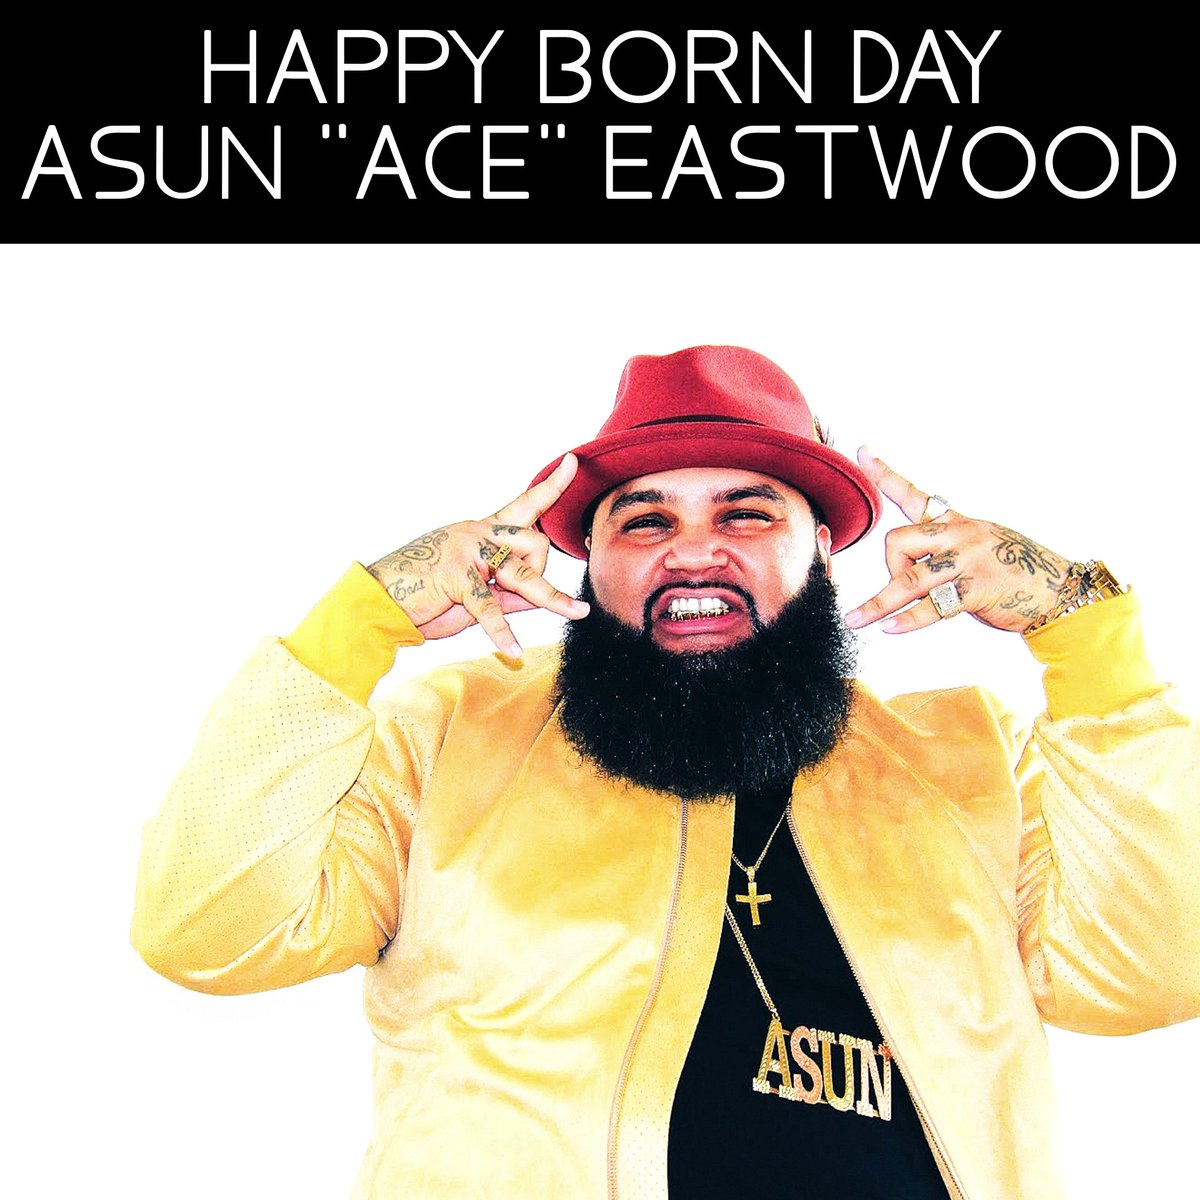 SALUTE @ASUNEASTWOOD  FEBRUARY 23  #therealyoska #america #english #mrquick #moveyo #asuneastwood #happybirthday #rapper #music #day